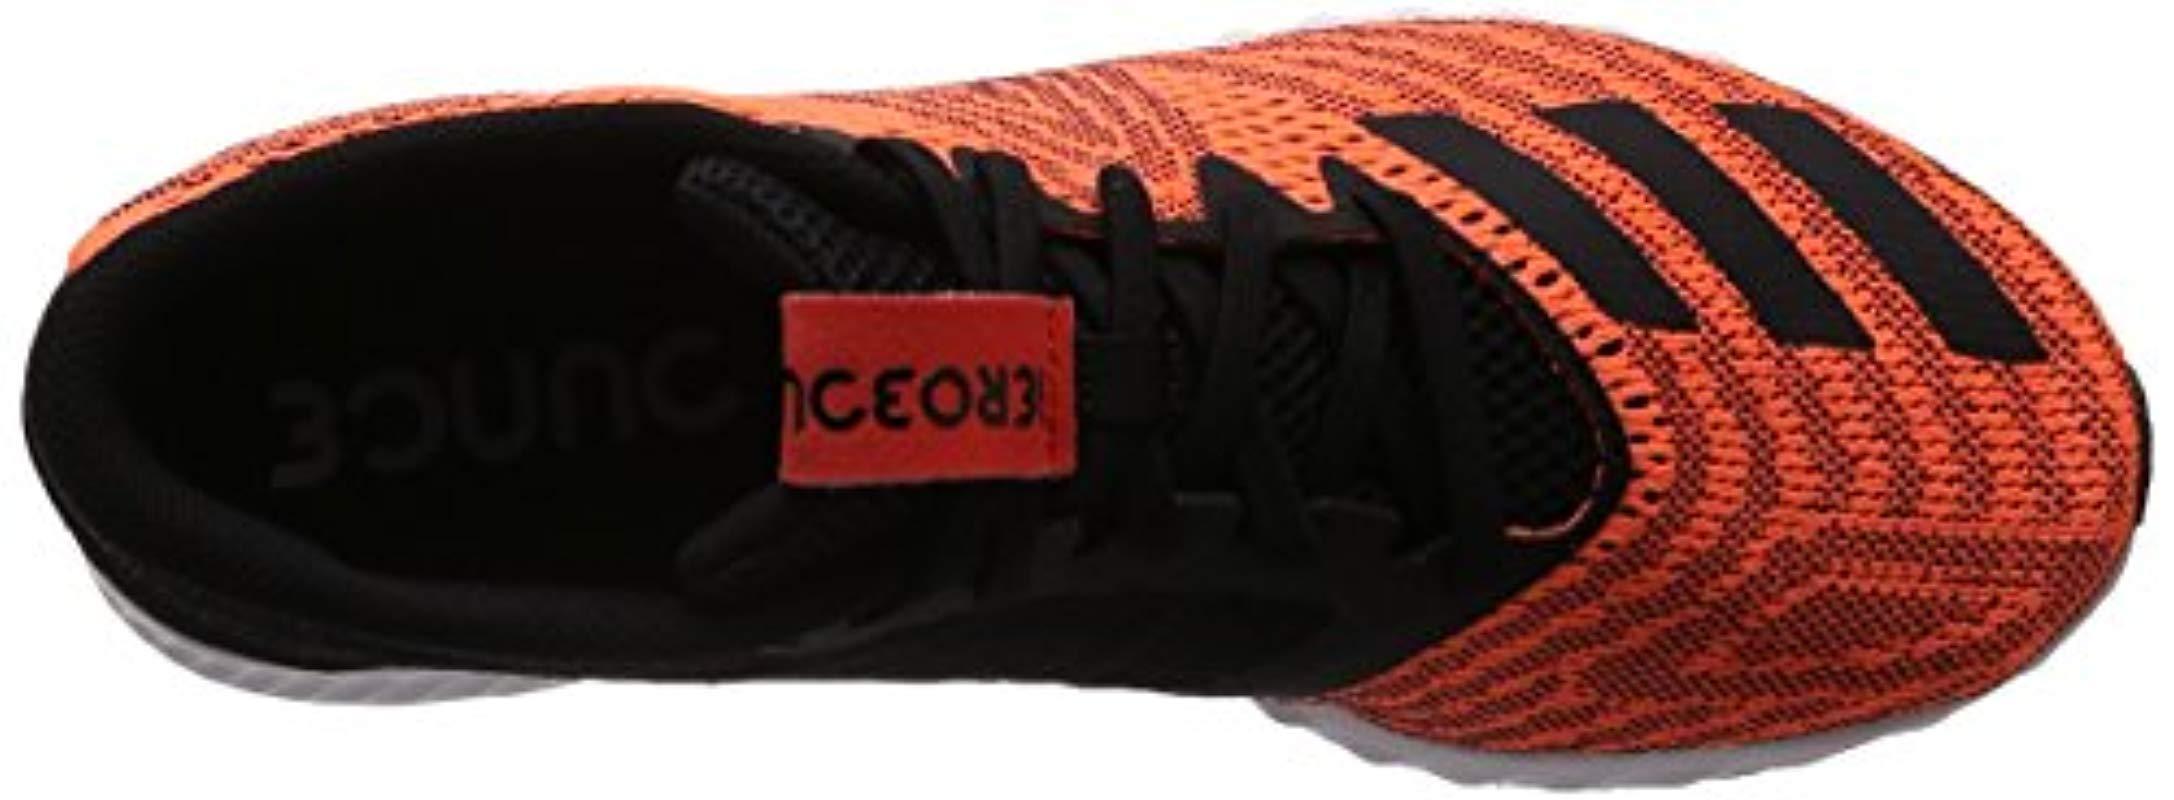 Aerobounce Pr M, Zapatillas de Deporte para Hombre adidas de hombre